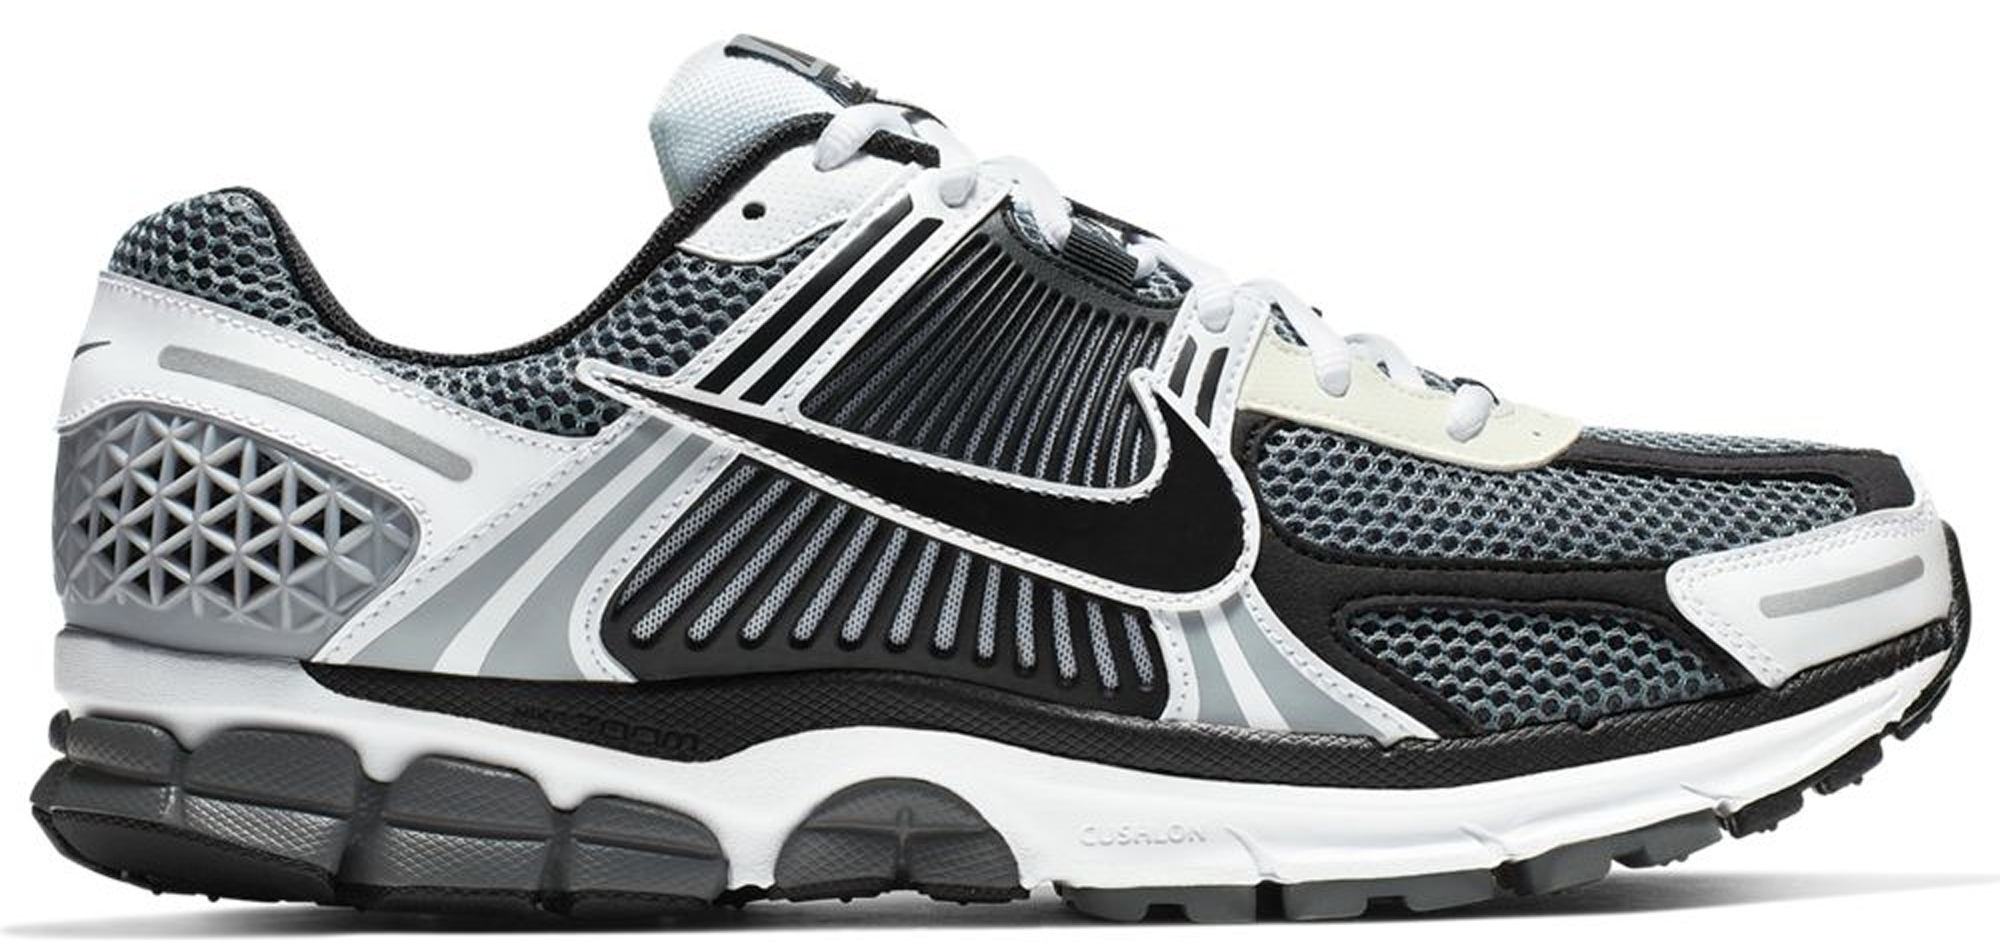 Nike Zoom Vomero 5 Dark Grey Black White by Stock X